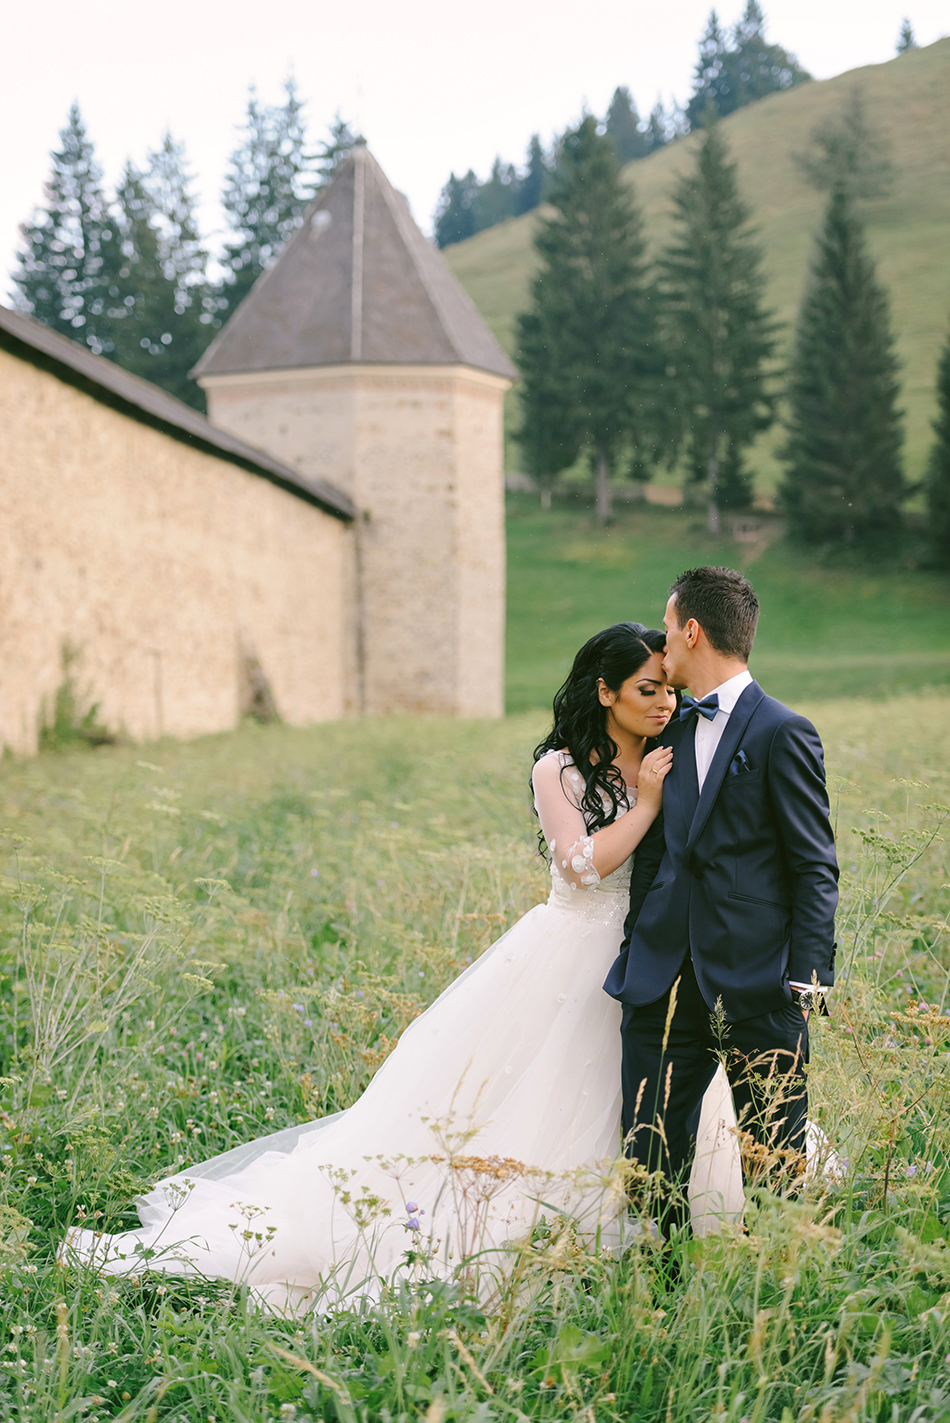 AD Passion Photography | ad-passion_diana-si-gabi_fotograf-nunta-suceava_0061 | Adelin, Dida, fotograf profesionist, fotograf de nunta, fotografie de nunta, fotograf Timisoara, fotograf Craiova, fotograf Bucuresti, fotograf Arad, nunta Timisoara, nunta Arad, nunta Bucuresti, nunta Craiova